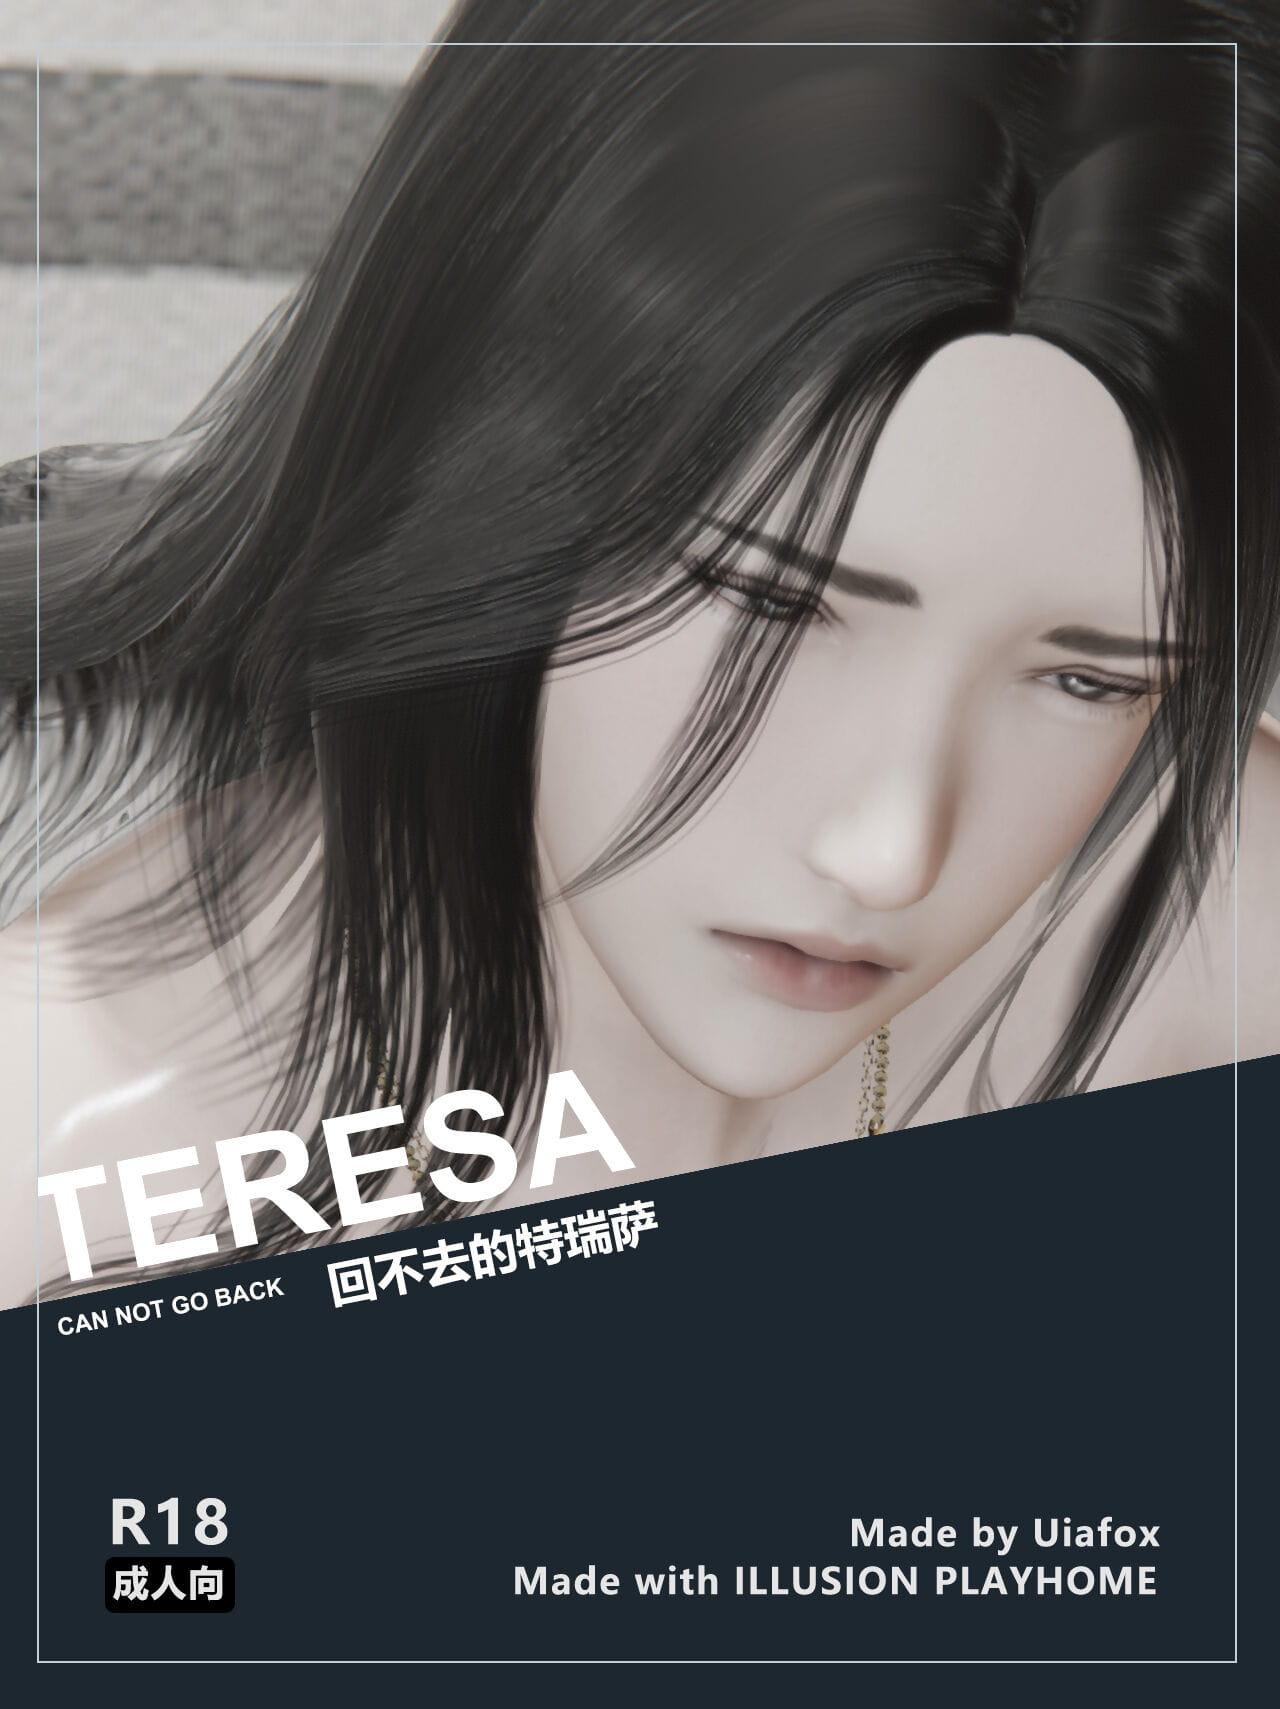 TERESA - Tuchis Pule Get ahead Not far from